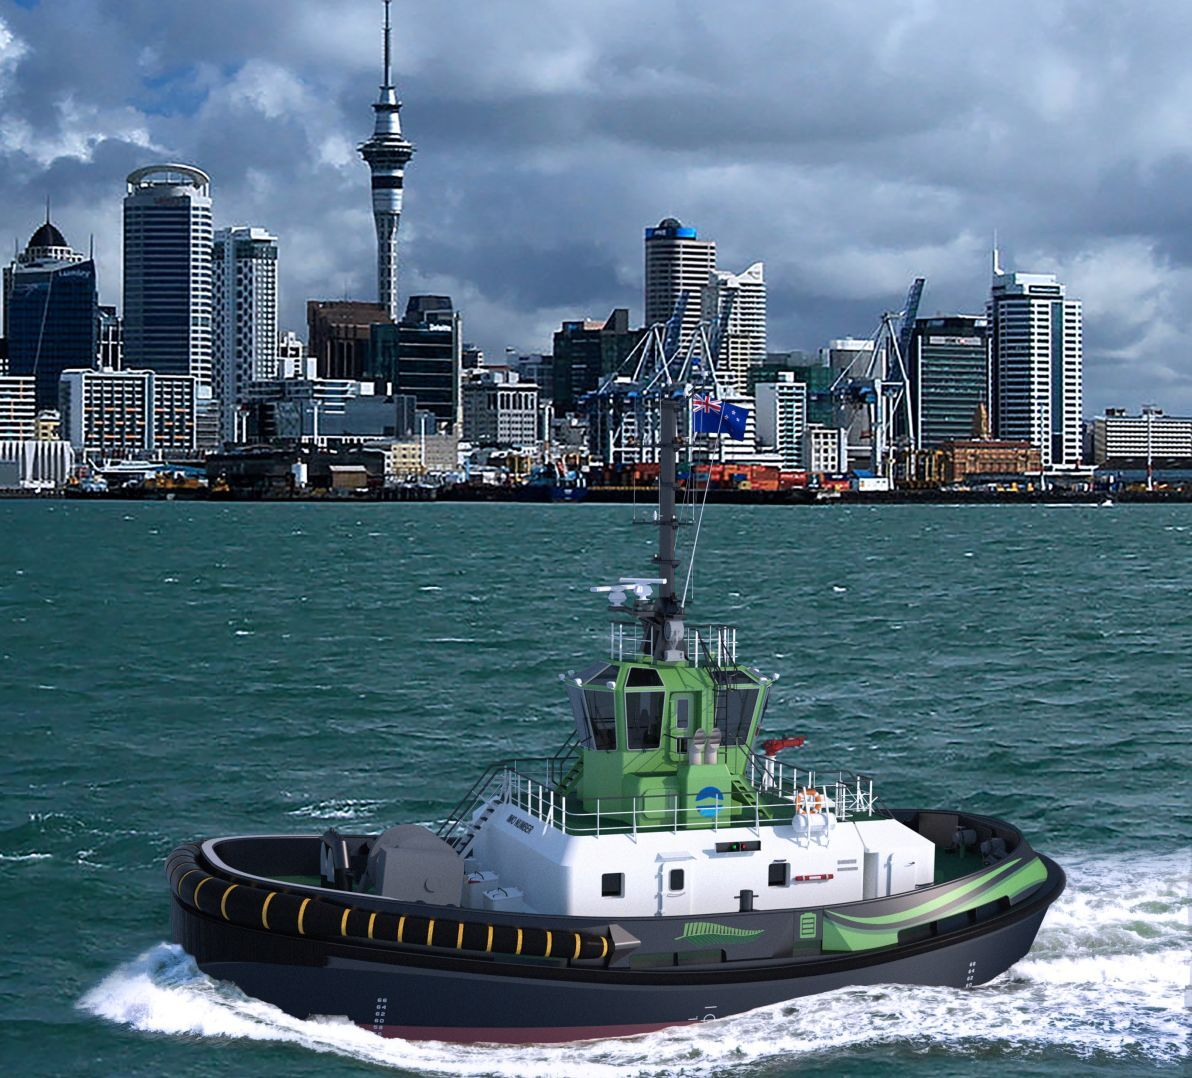 Artist's impression of an RSD-E Tug 2513 Damen is building for Port of Auckland (source: Damen)